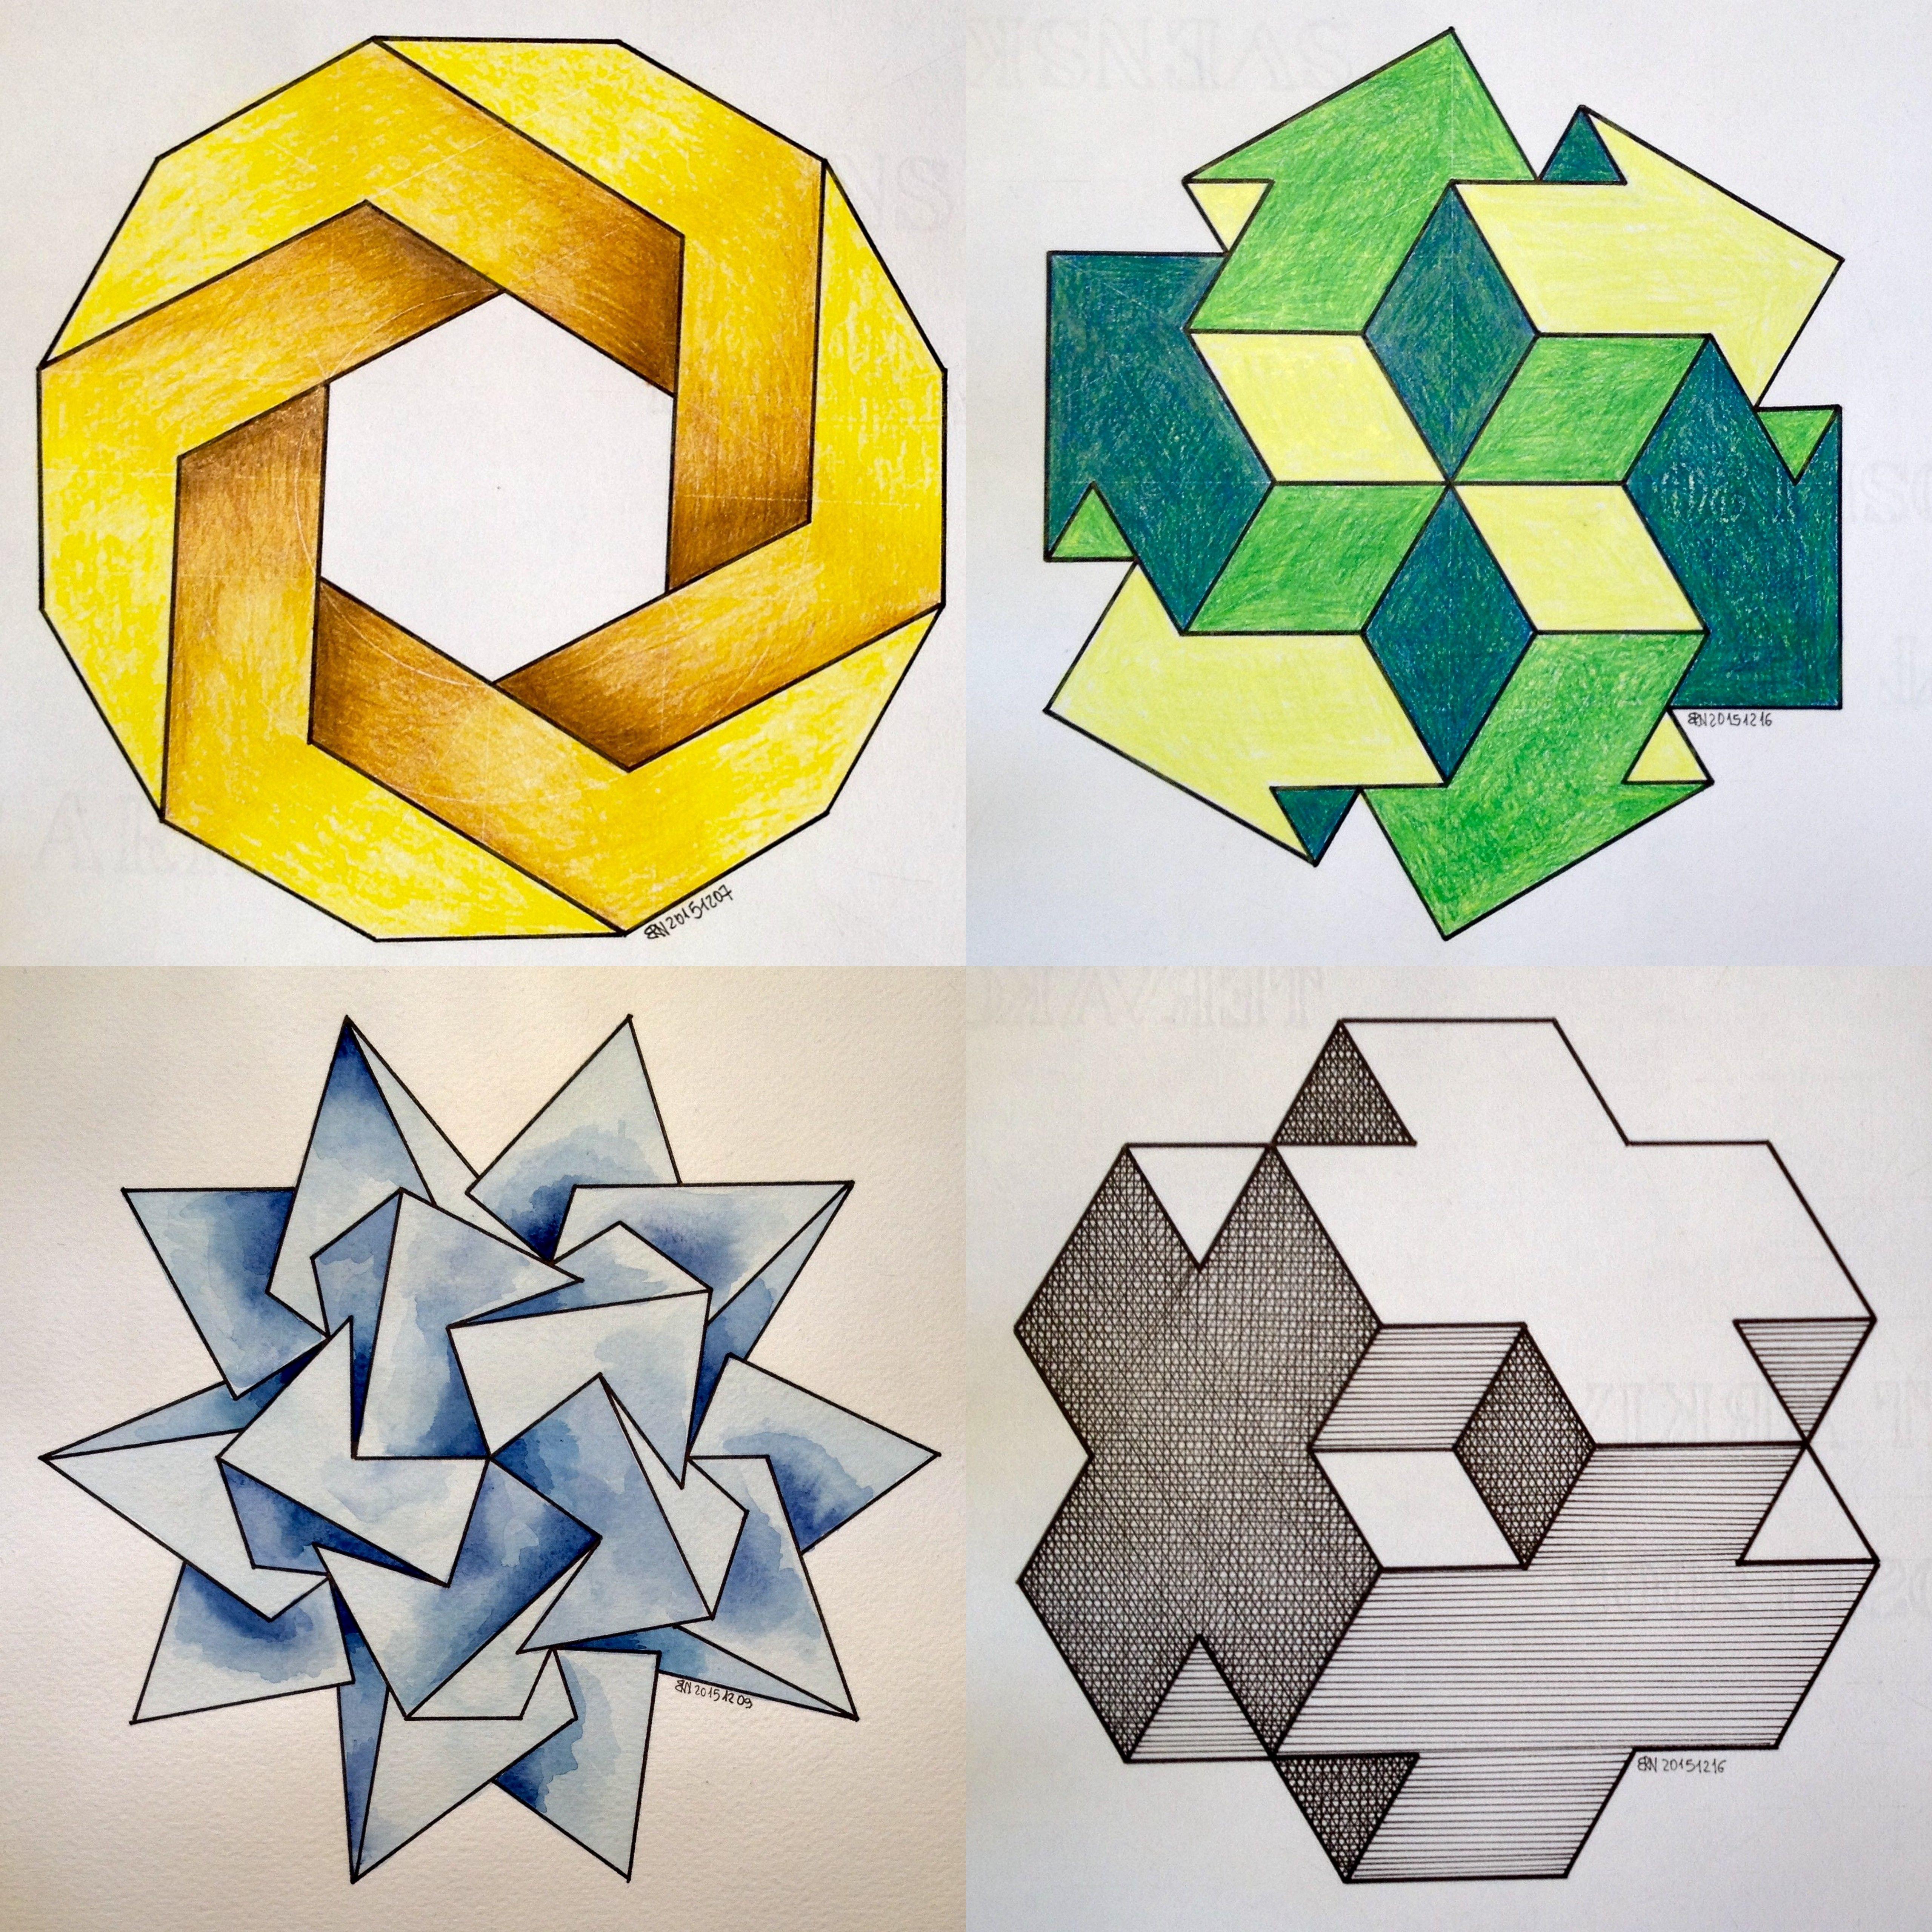 Solid Polyhedra Geometry Symmetry Handmade Mathart